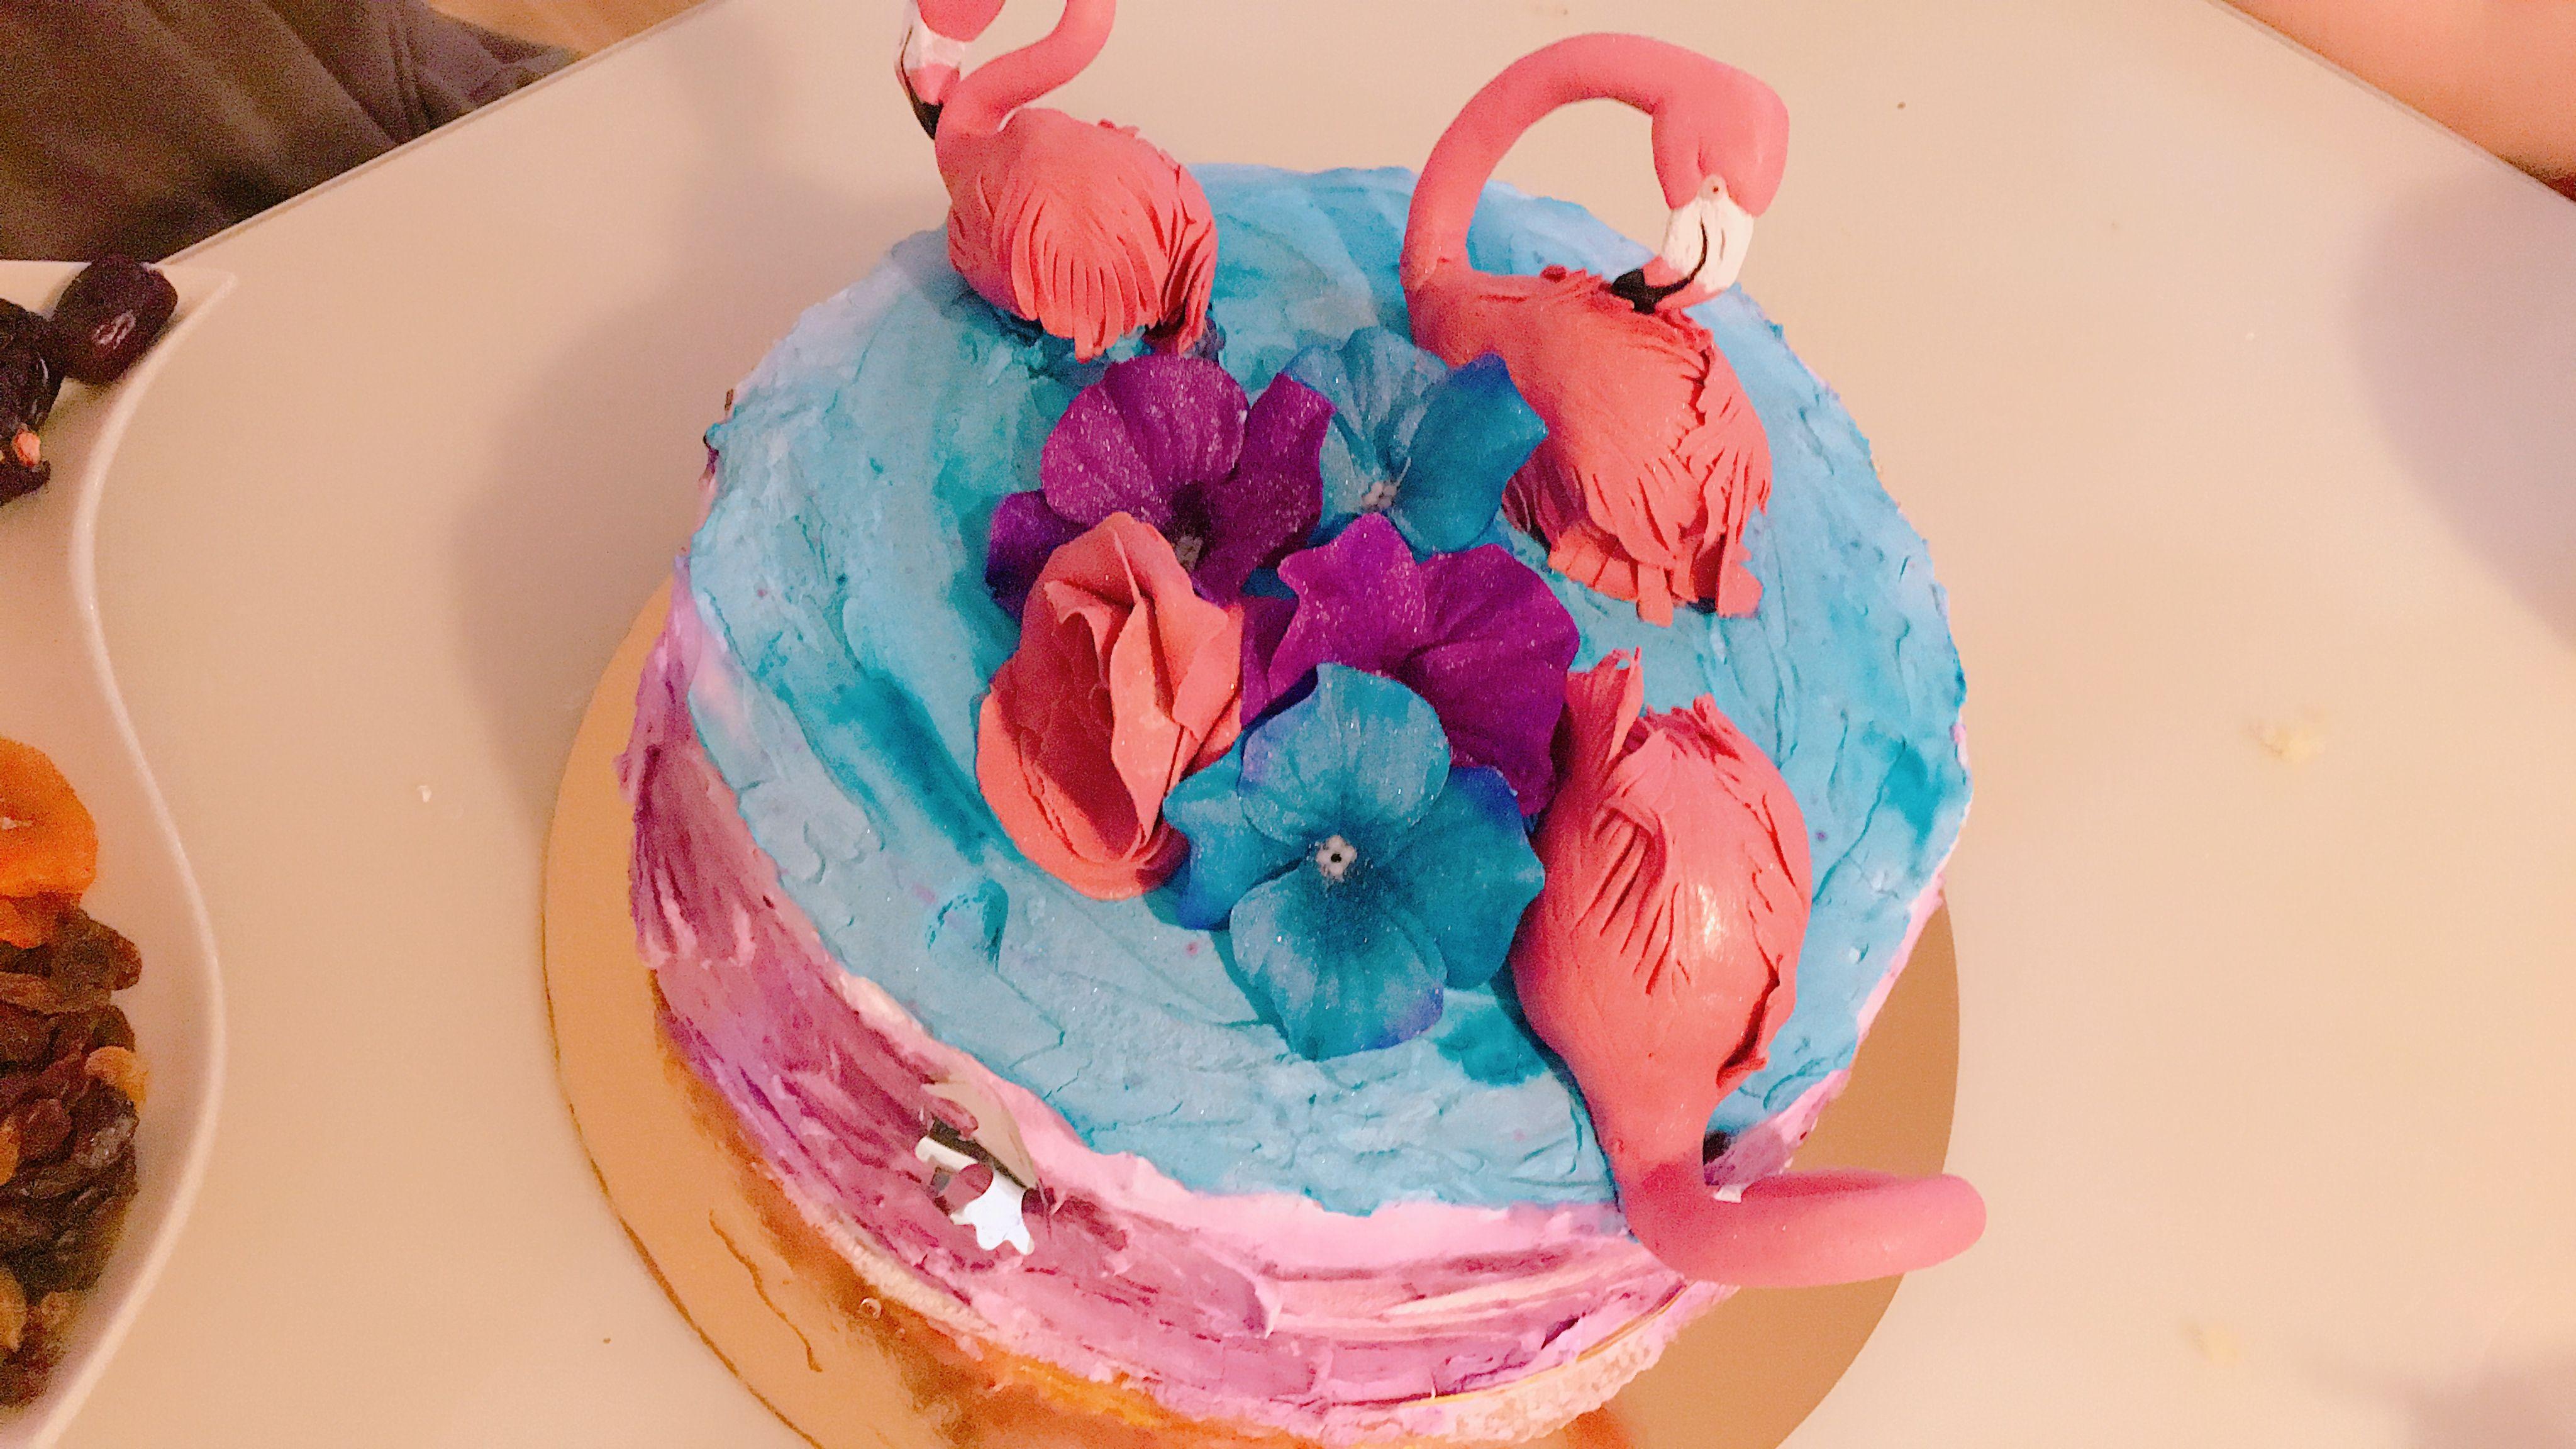 Flamingo Cake Tort S Flamingo Flamingo Krasnaya Flamingo Flamingo البشروس طائر مائي Flamenco Fenicottero Cake Desserts Food